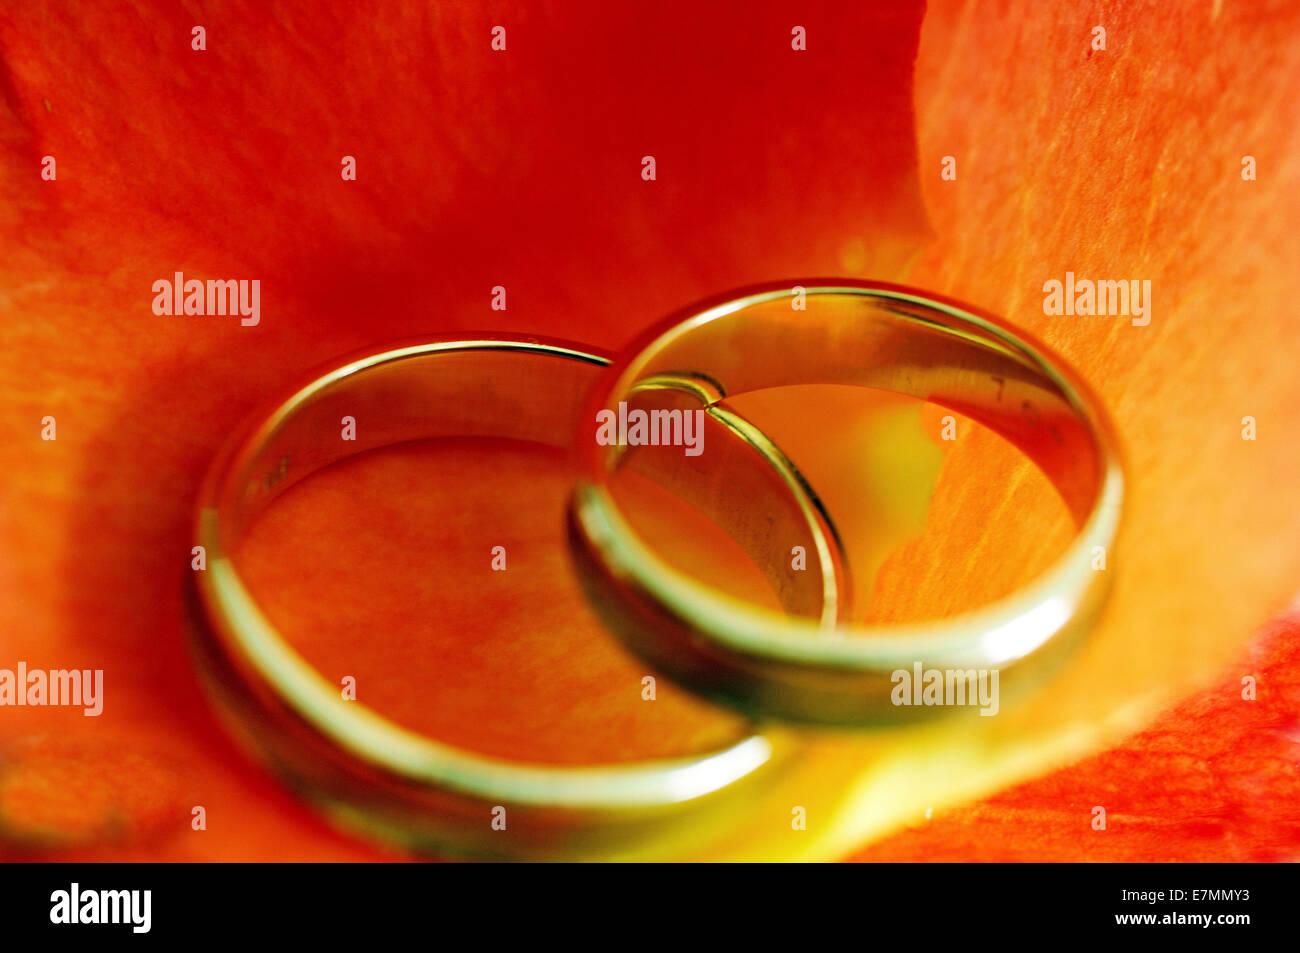 Wedding rings on orange colored flower petals - Stock Image